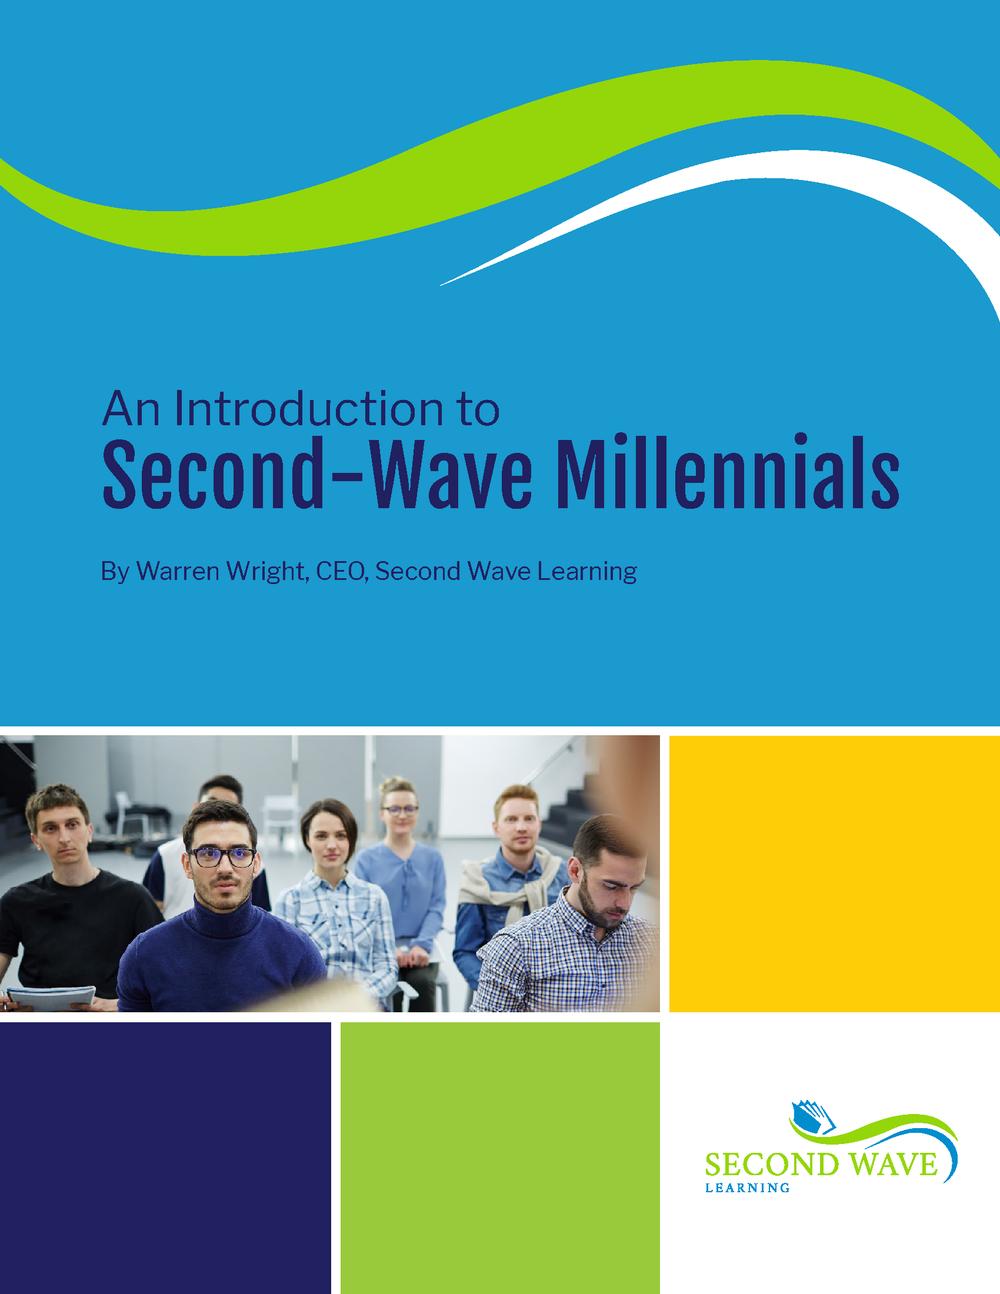 Second-Wave Millennials_white paper Final.png